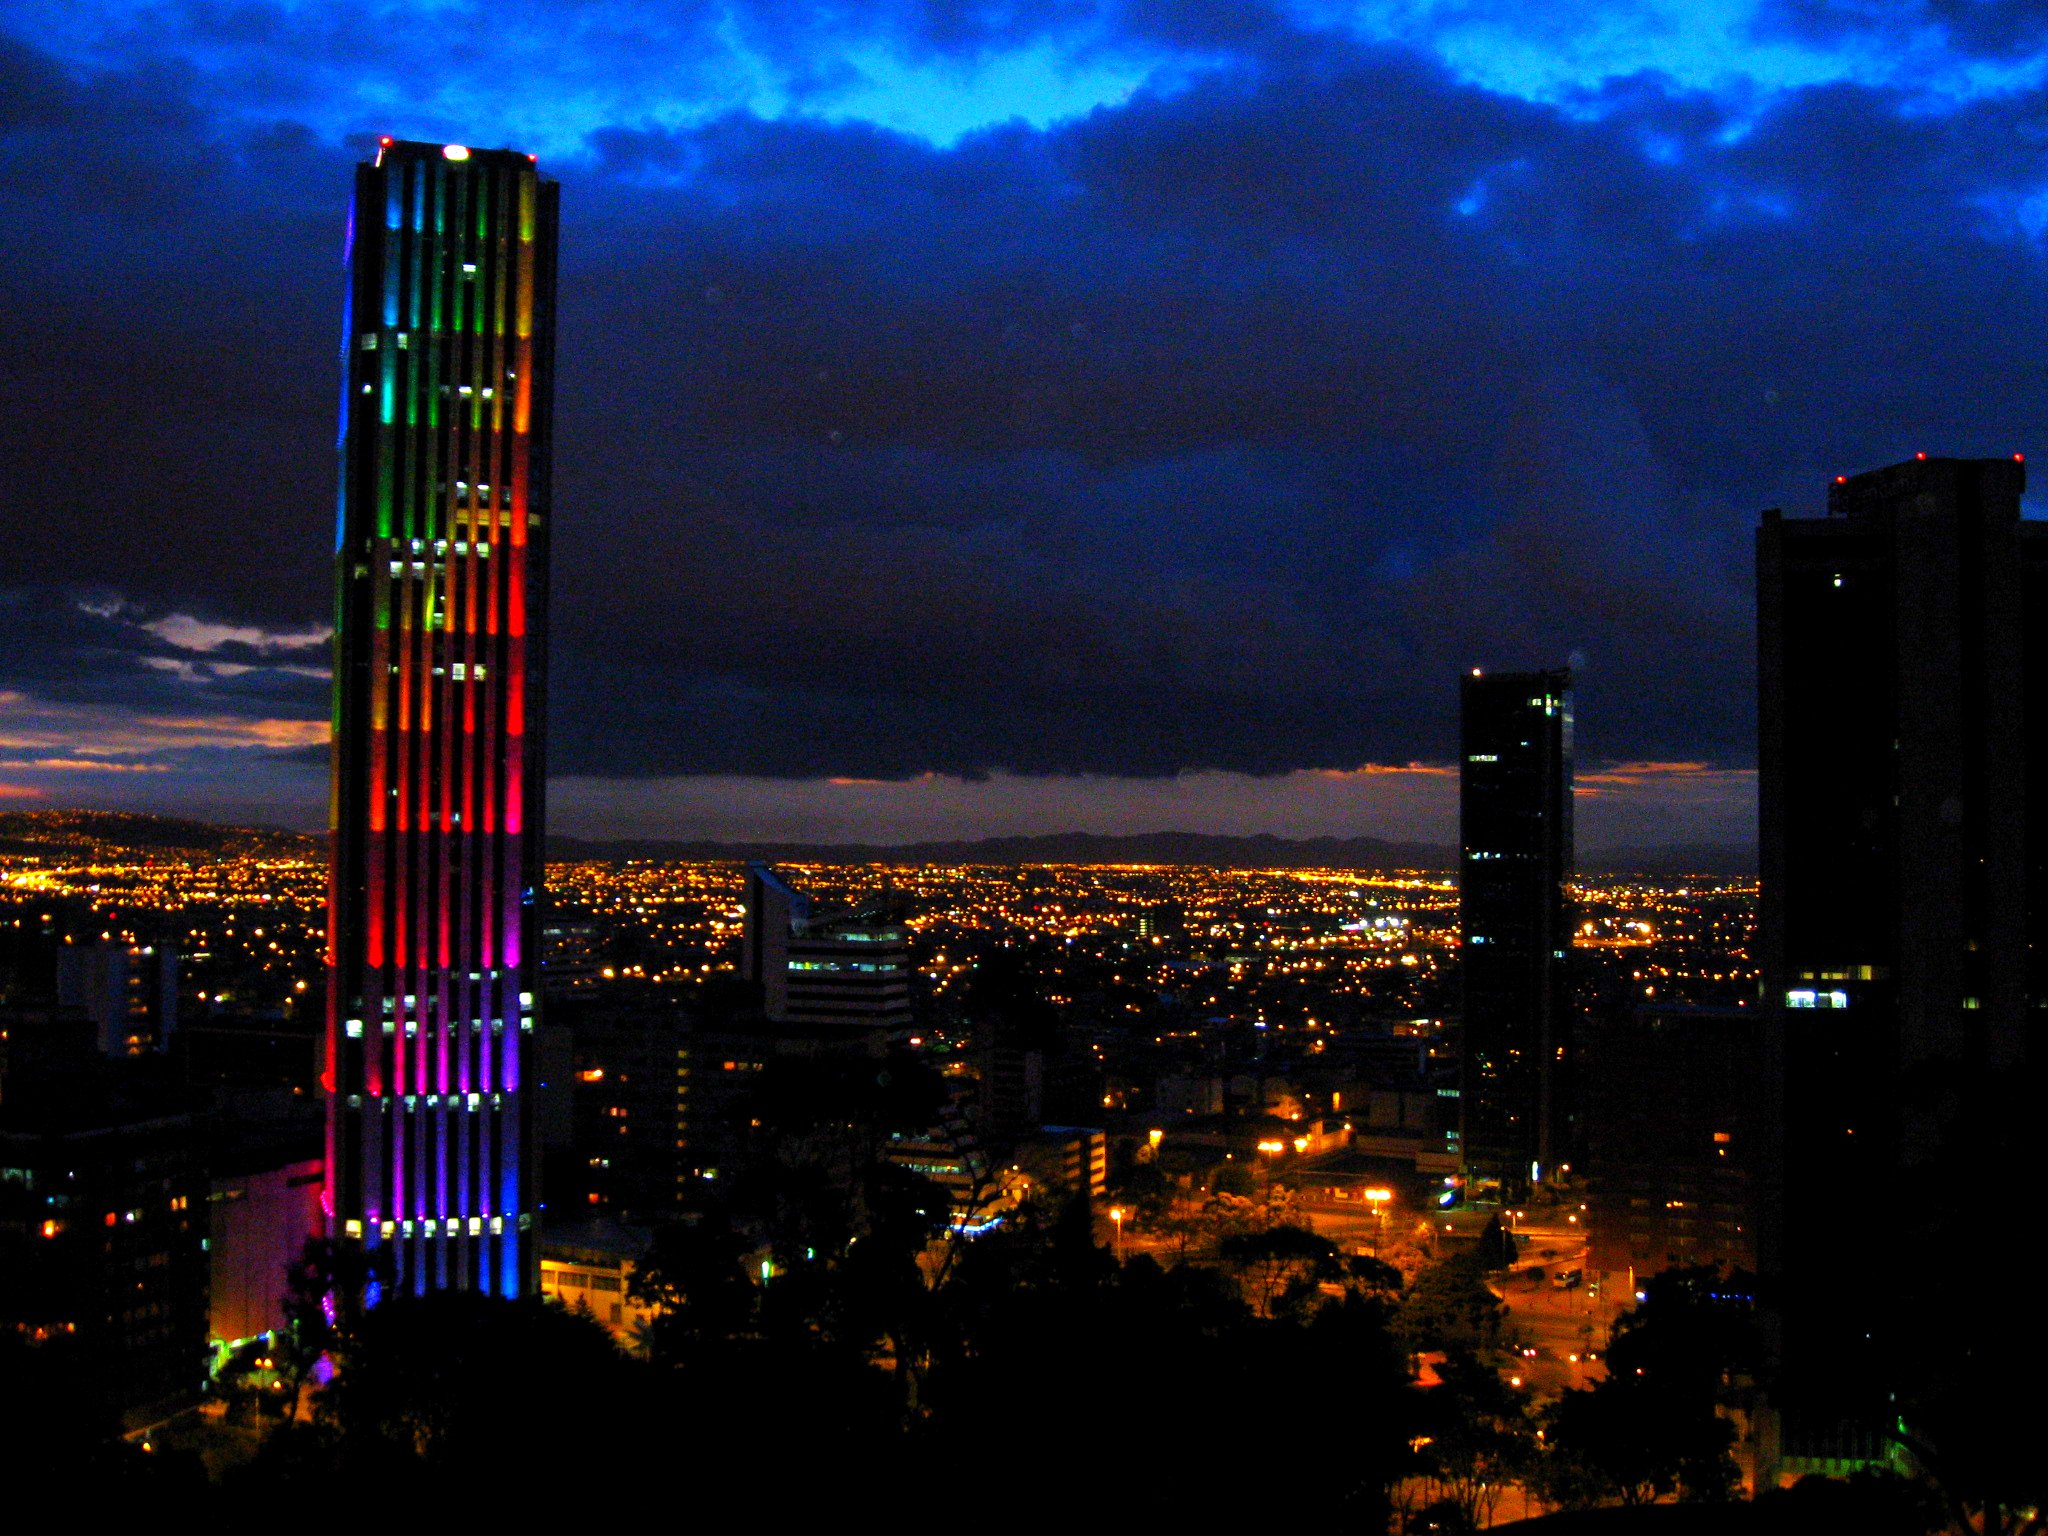 Bogota. Colombia trip part 1. - My way to travel  |Bogota